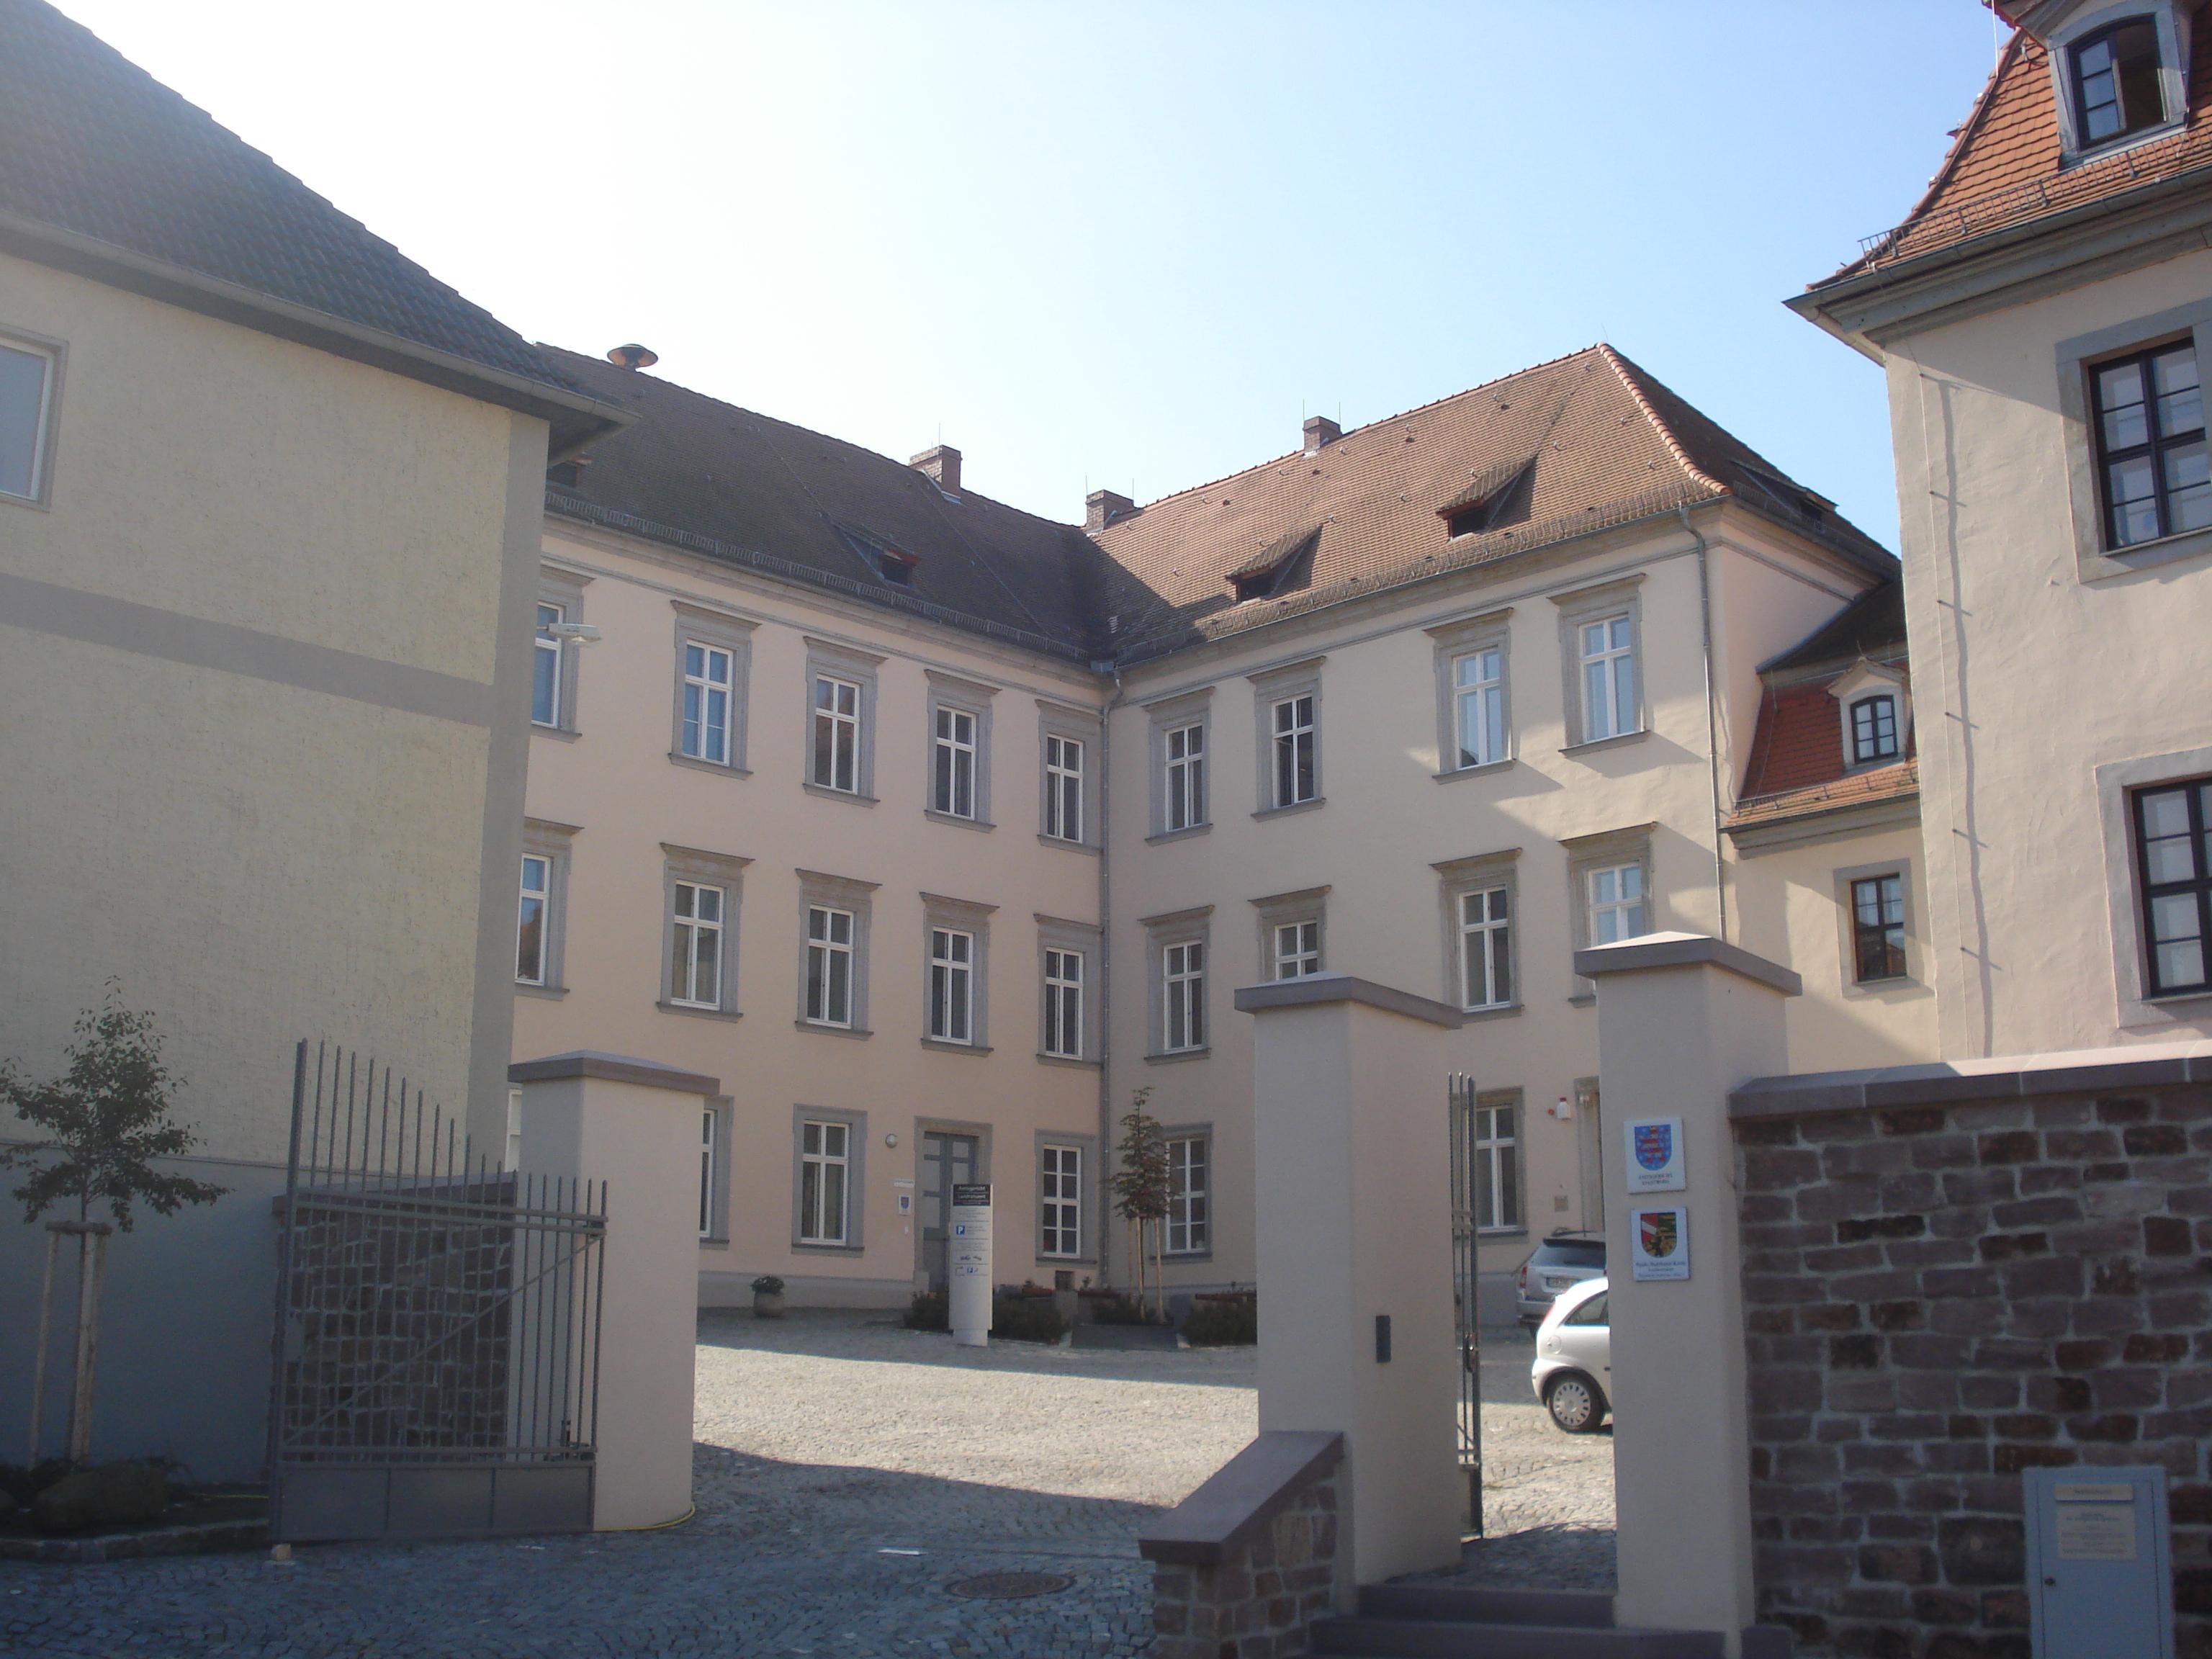 Bild: Gerichtsgebäude des Amtsgerichts Stadtroda